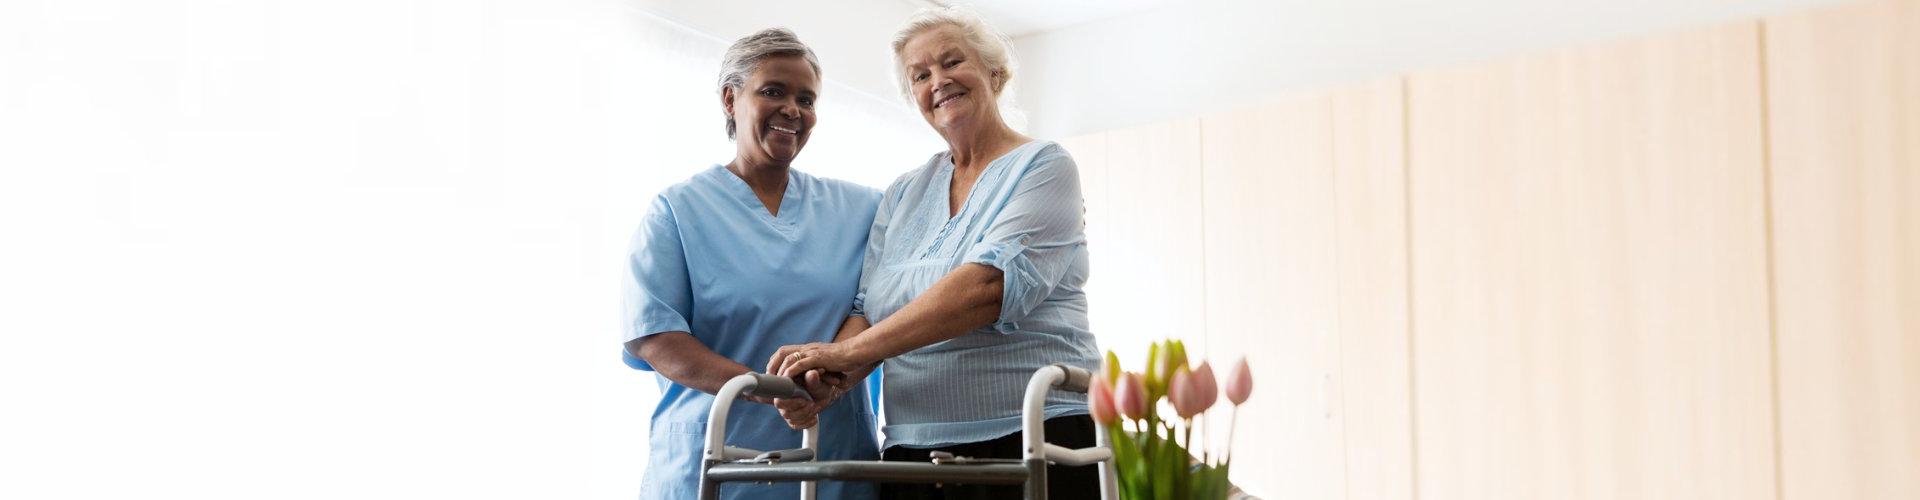 nurse standing by senior woman holding walker in nursing home